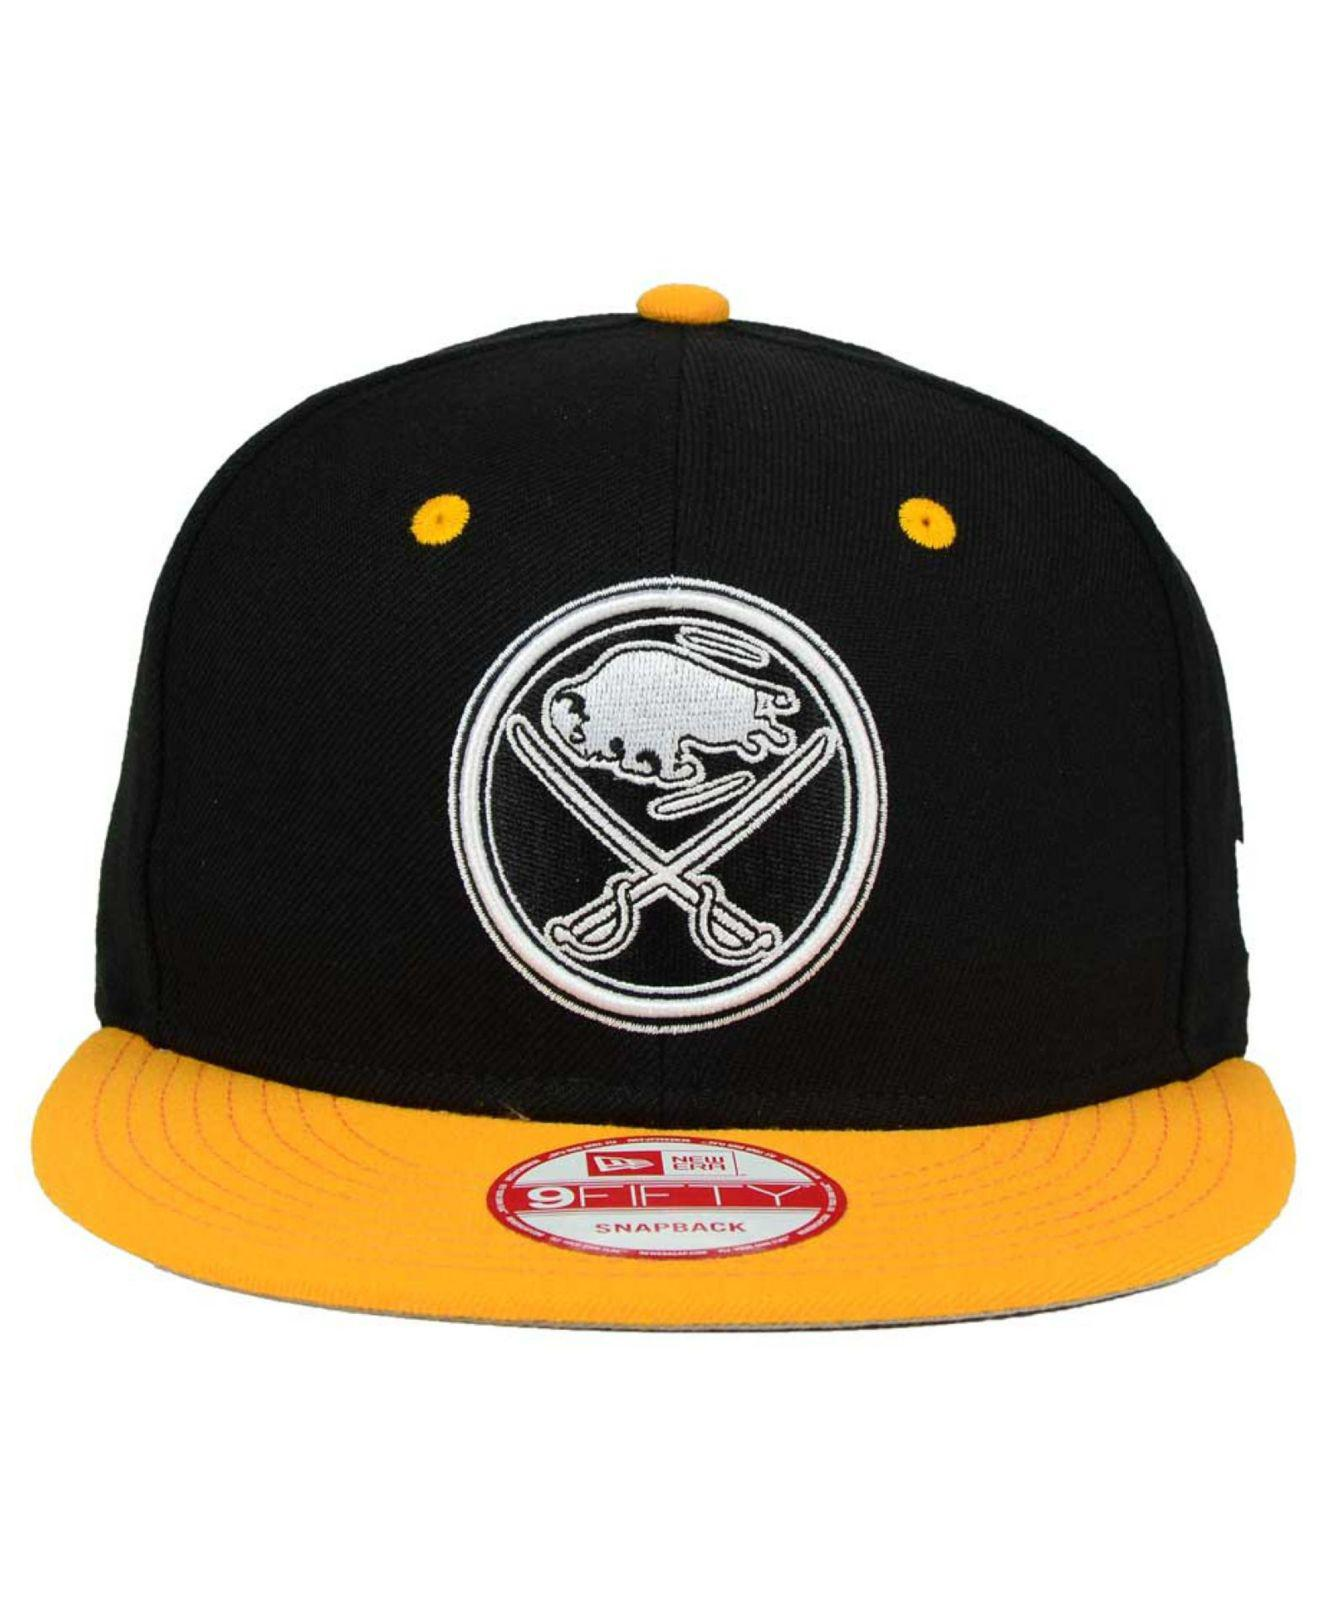 Lyst - KTZ Buffalo Sabres Black White Team Color 9fifty Snapback Cap in  Black for Men e133eb9513ee